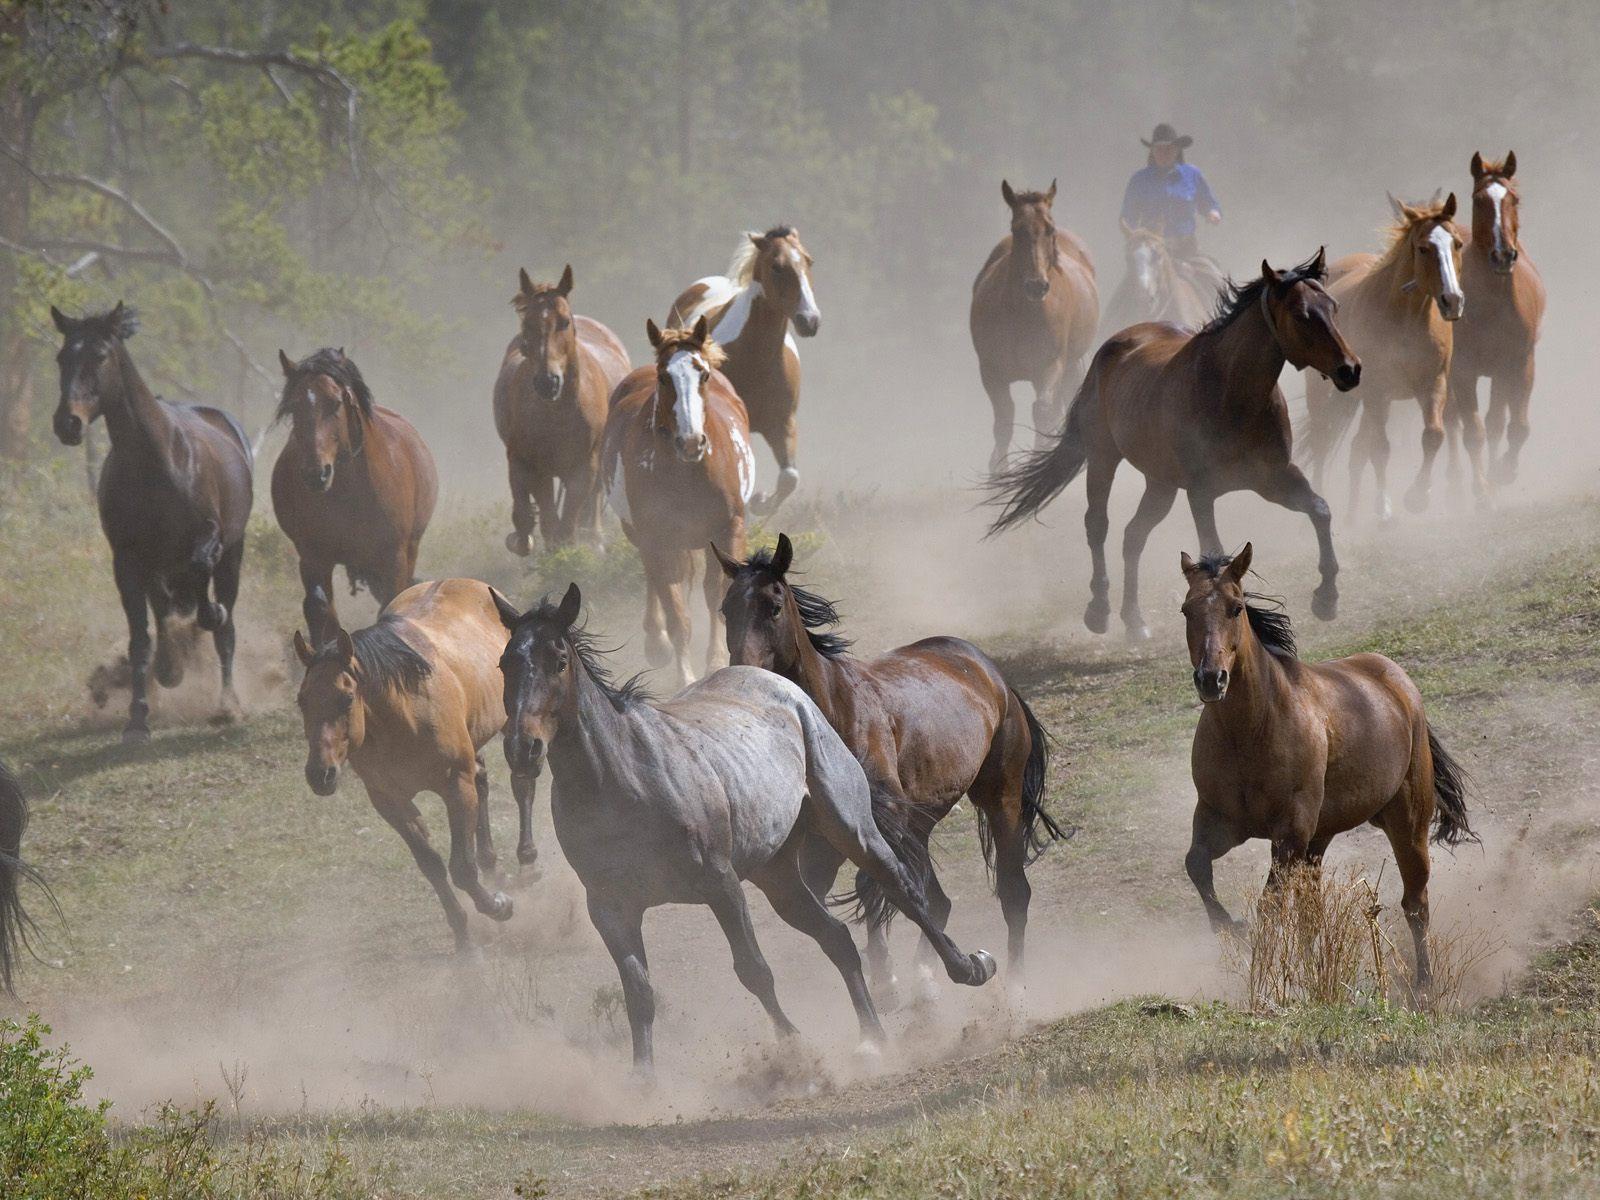 Japan Running Horses Wallpapers for Desktop Backgrounds 1600x1200